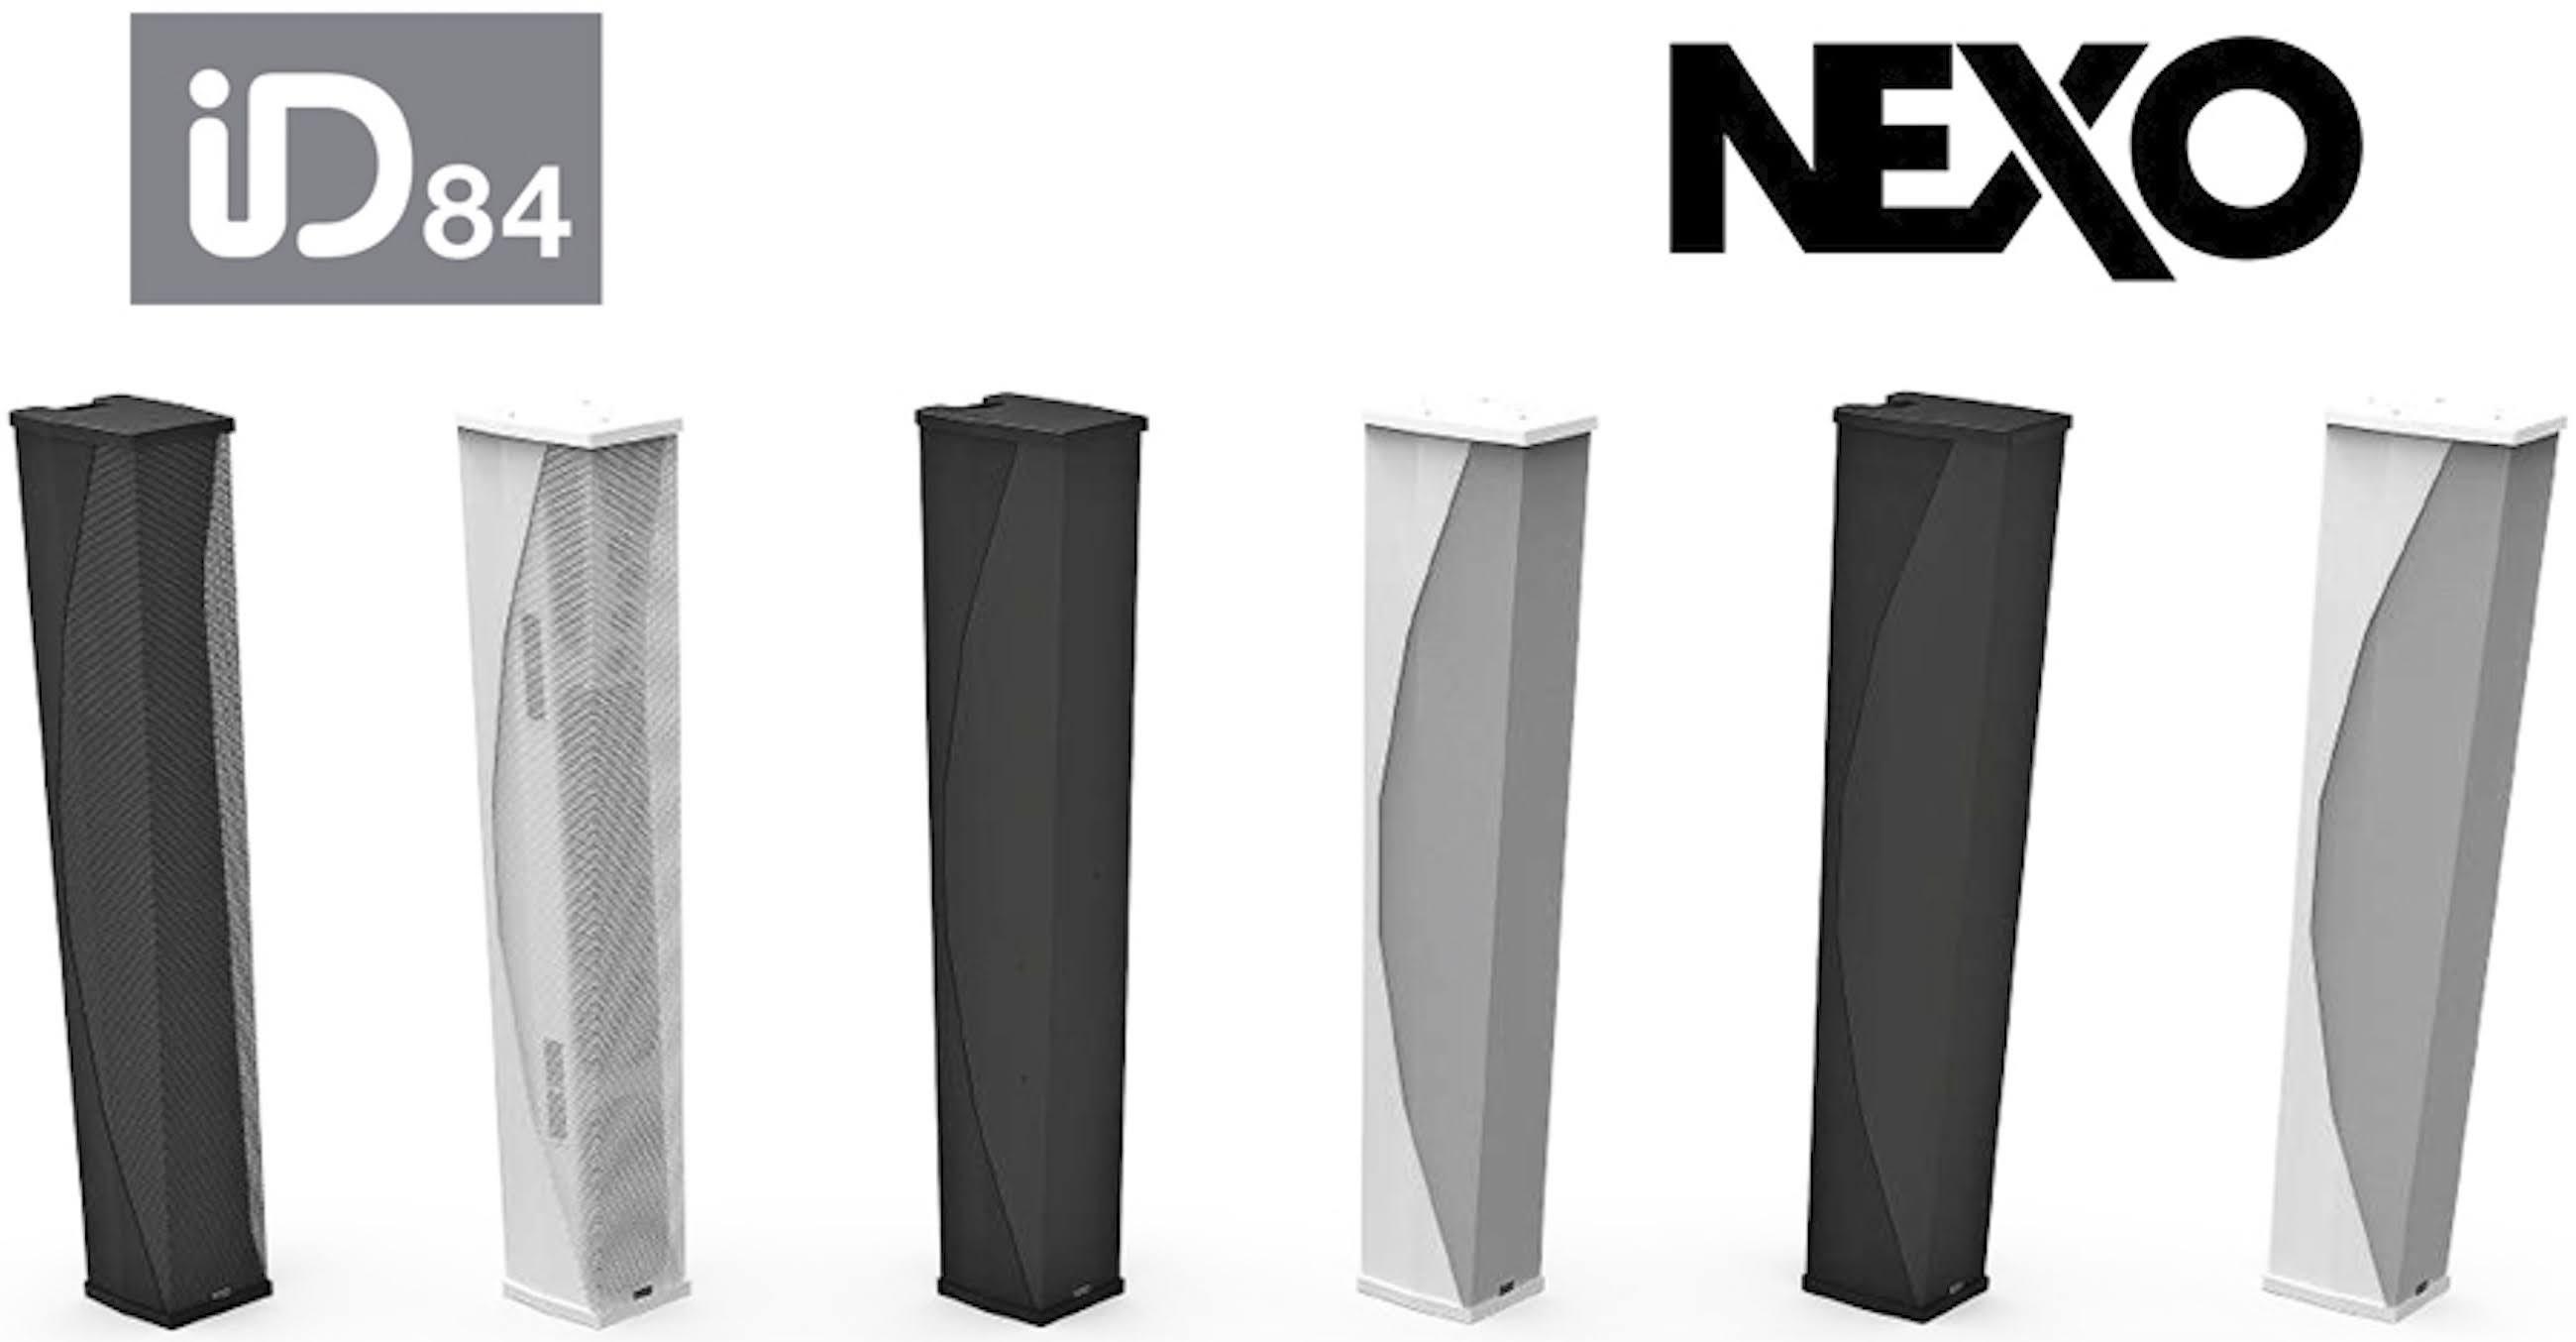 Yamaha Pro Audio NEXO ID84 v6 Column Speaker